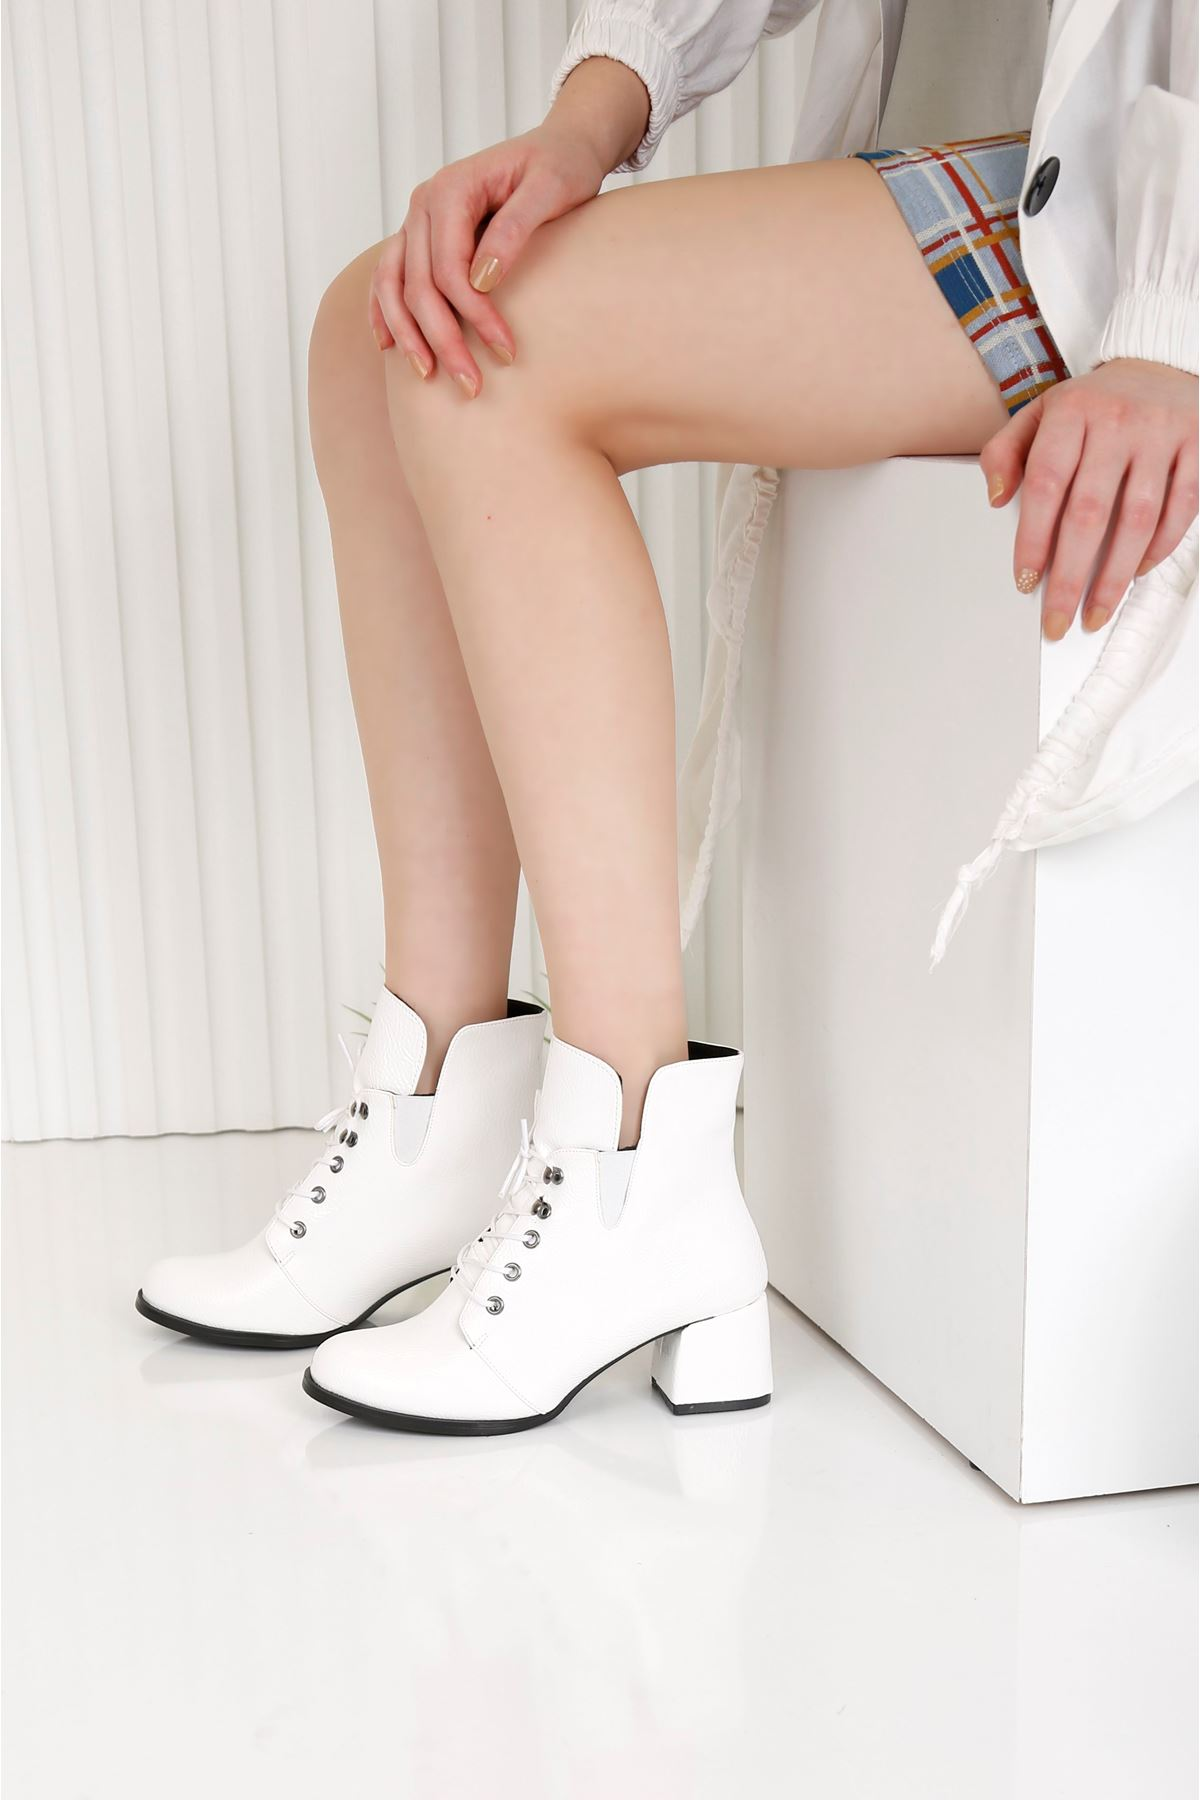 TRAUM Beyaz Topuklu Kadın Bot